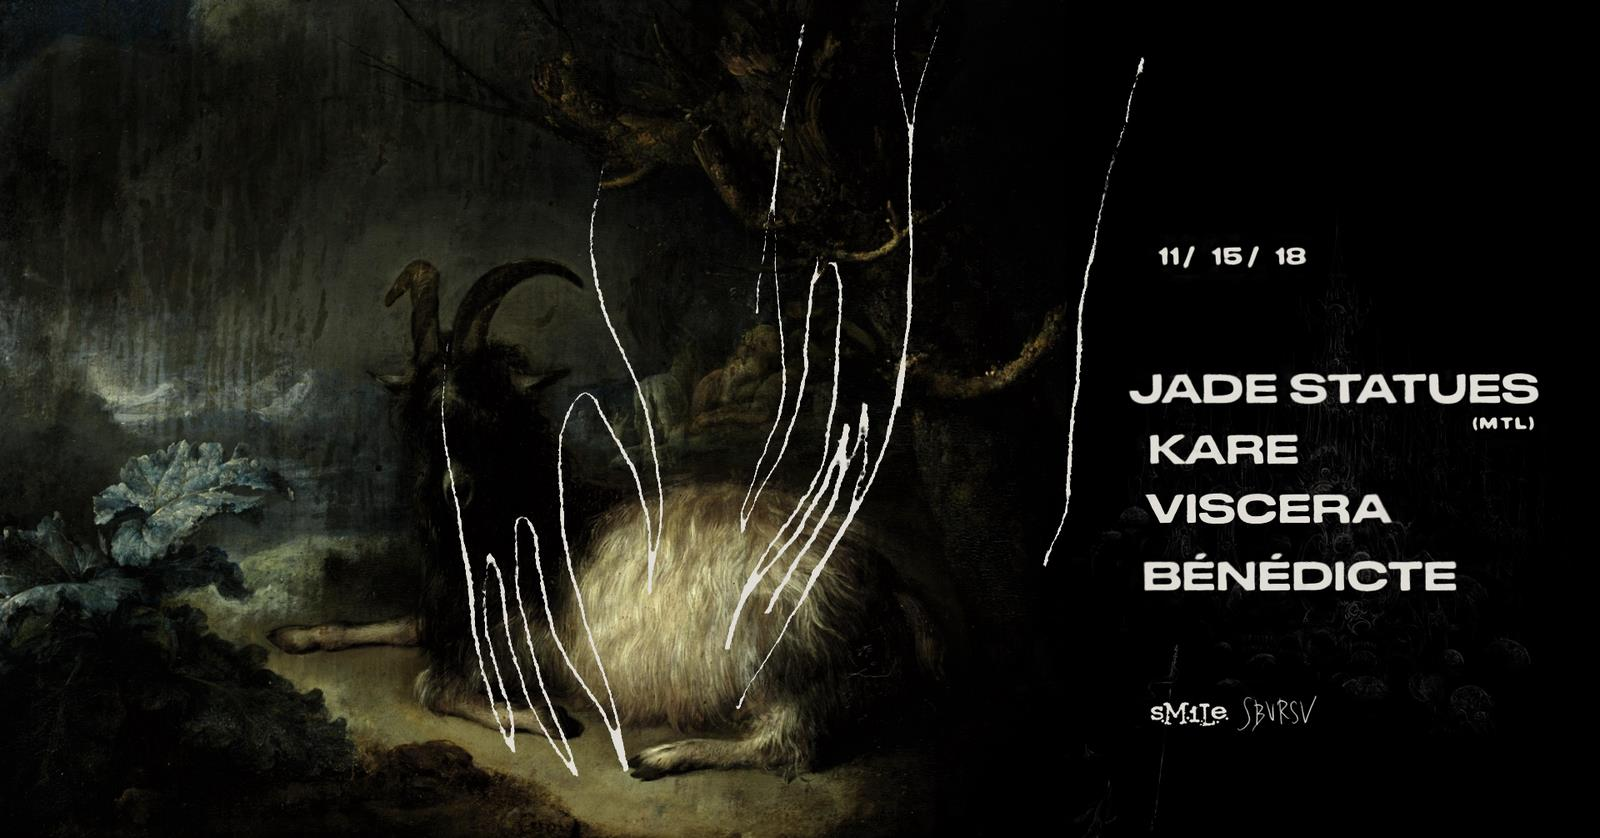 jadestatuses-with-viscera-Bénédicte-kare